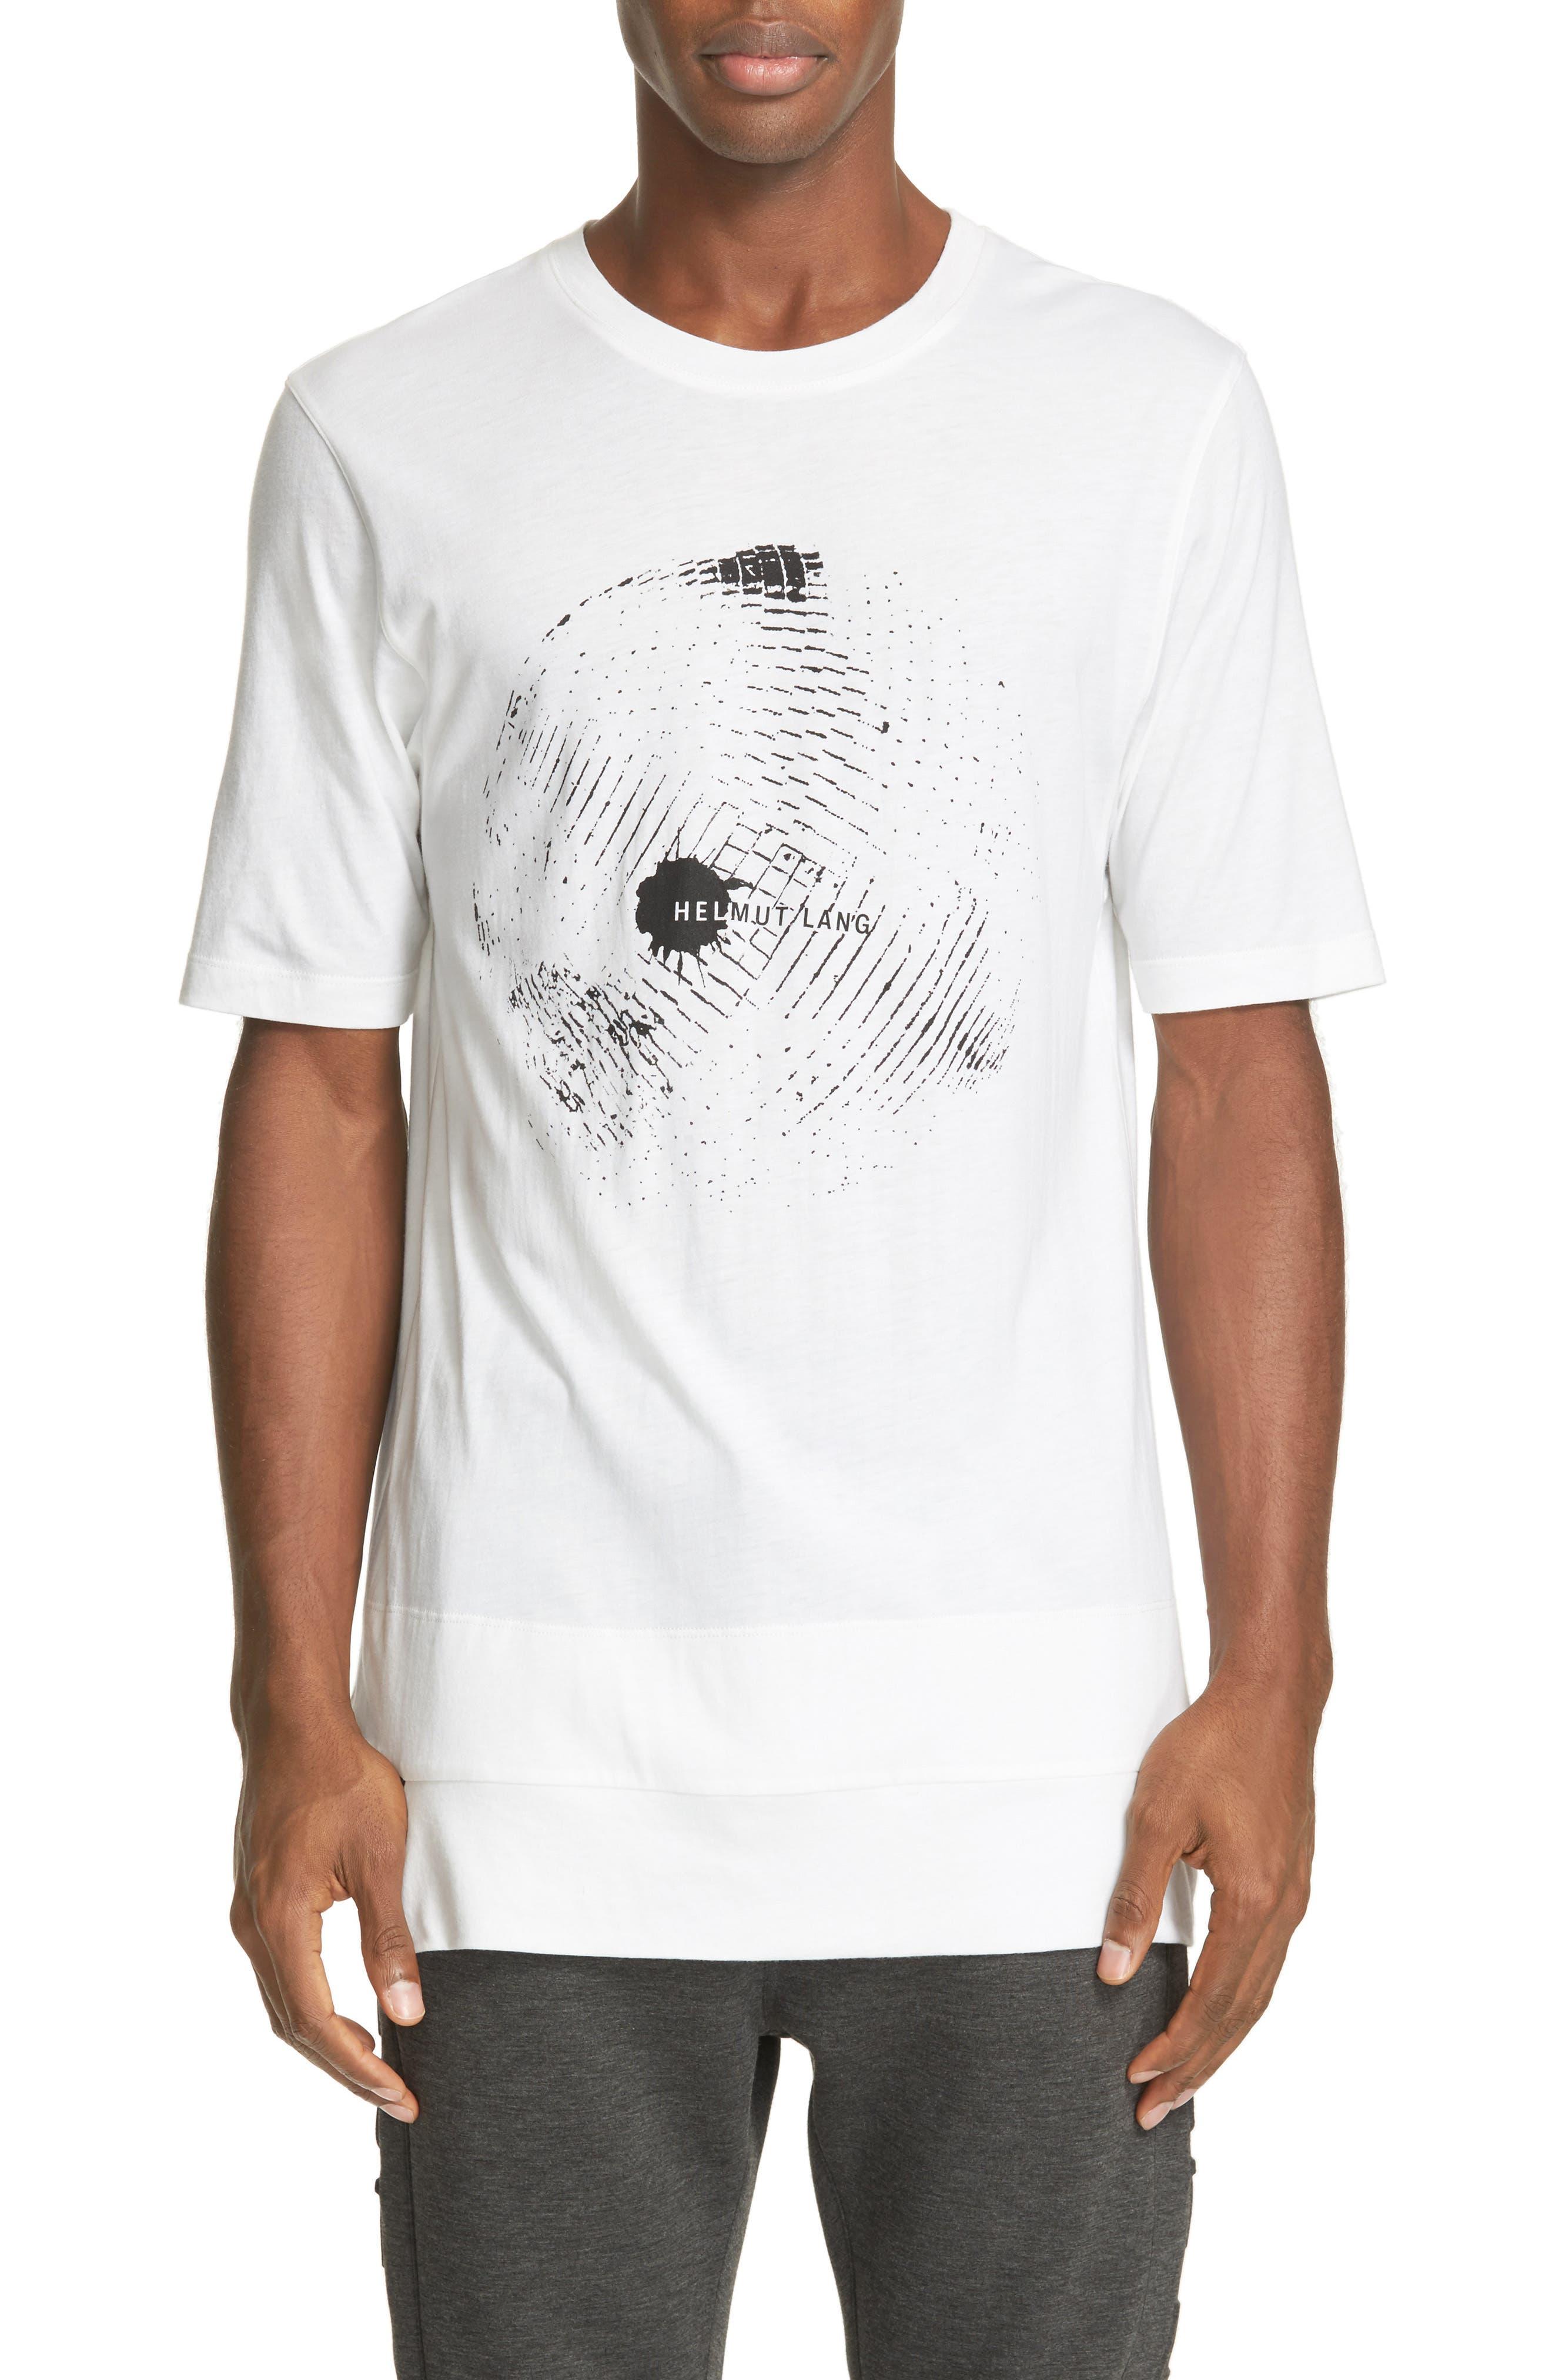 HELMUT LANG Disco Ball Graphic Sliced Hem T-Shirt